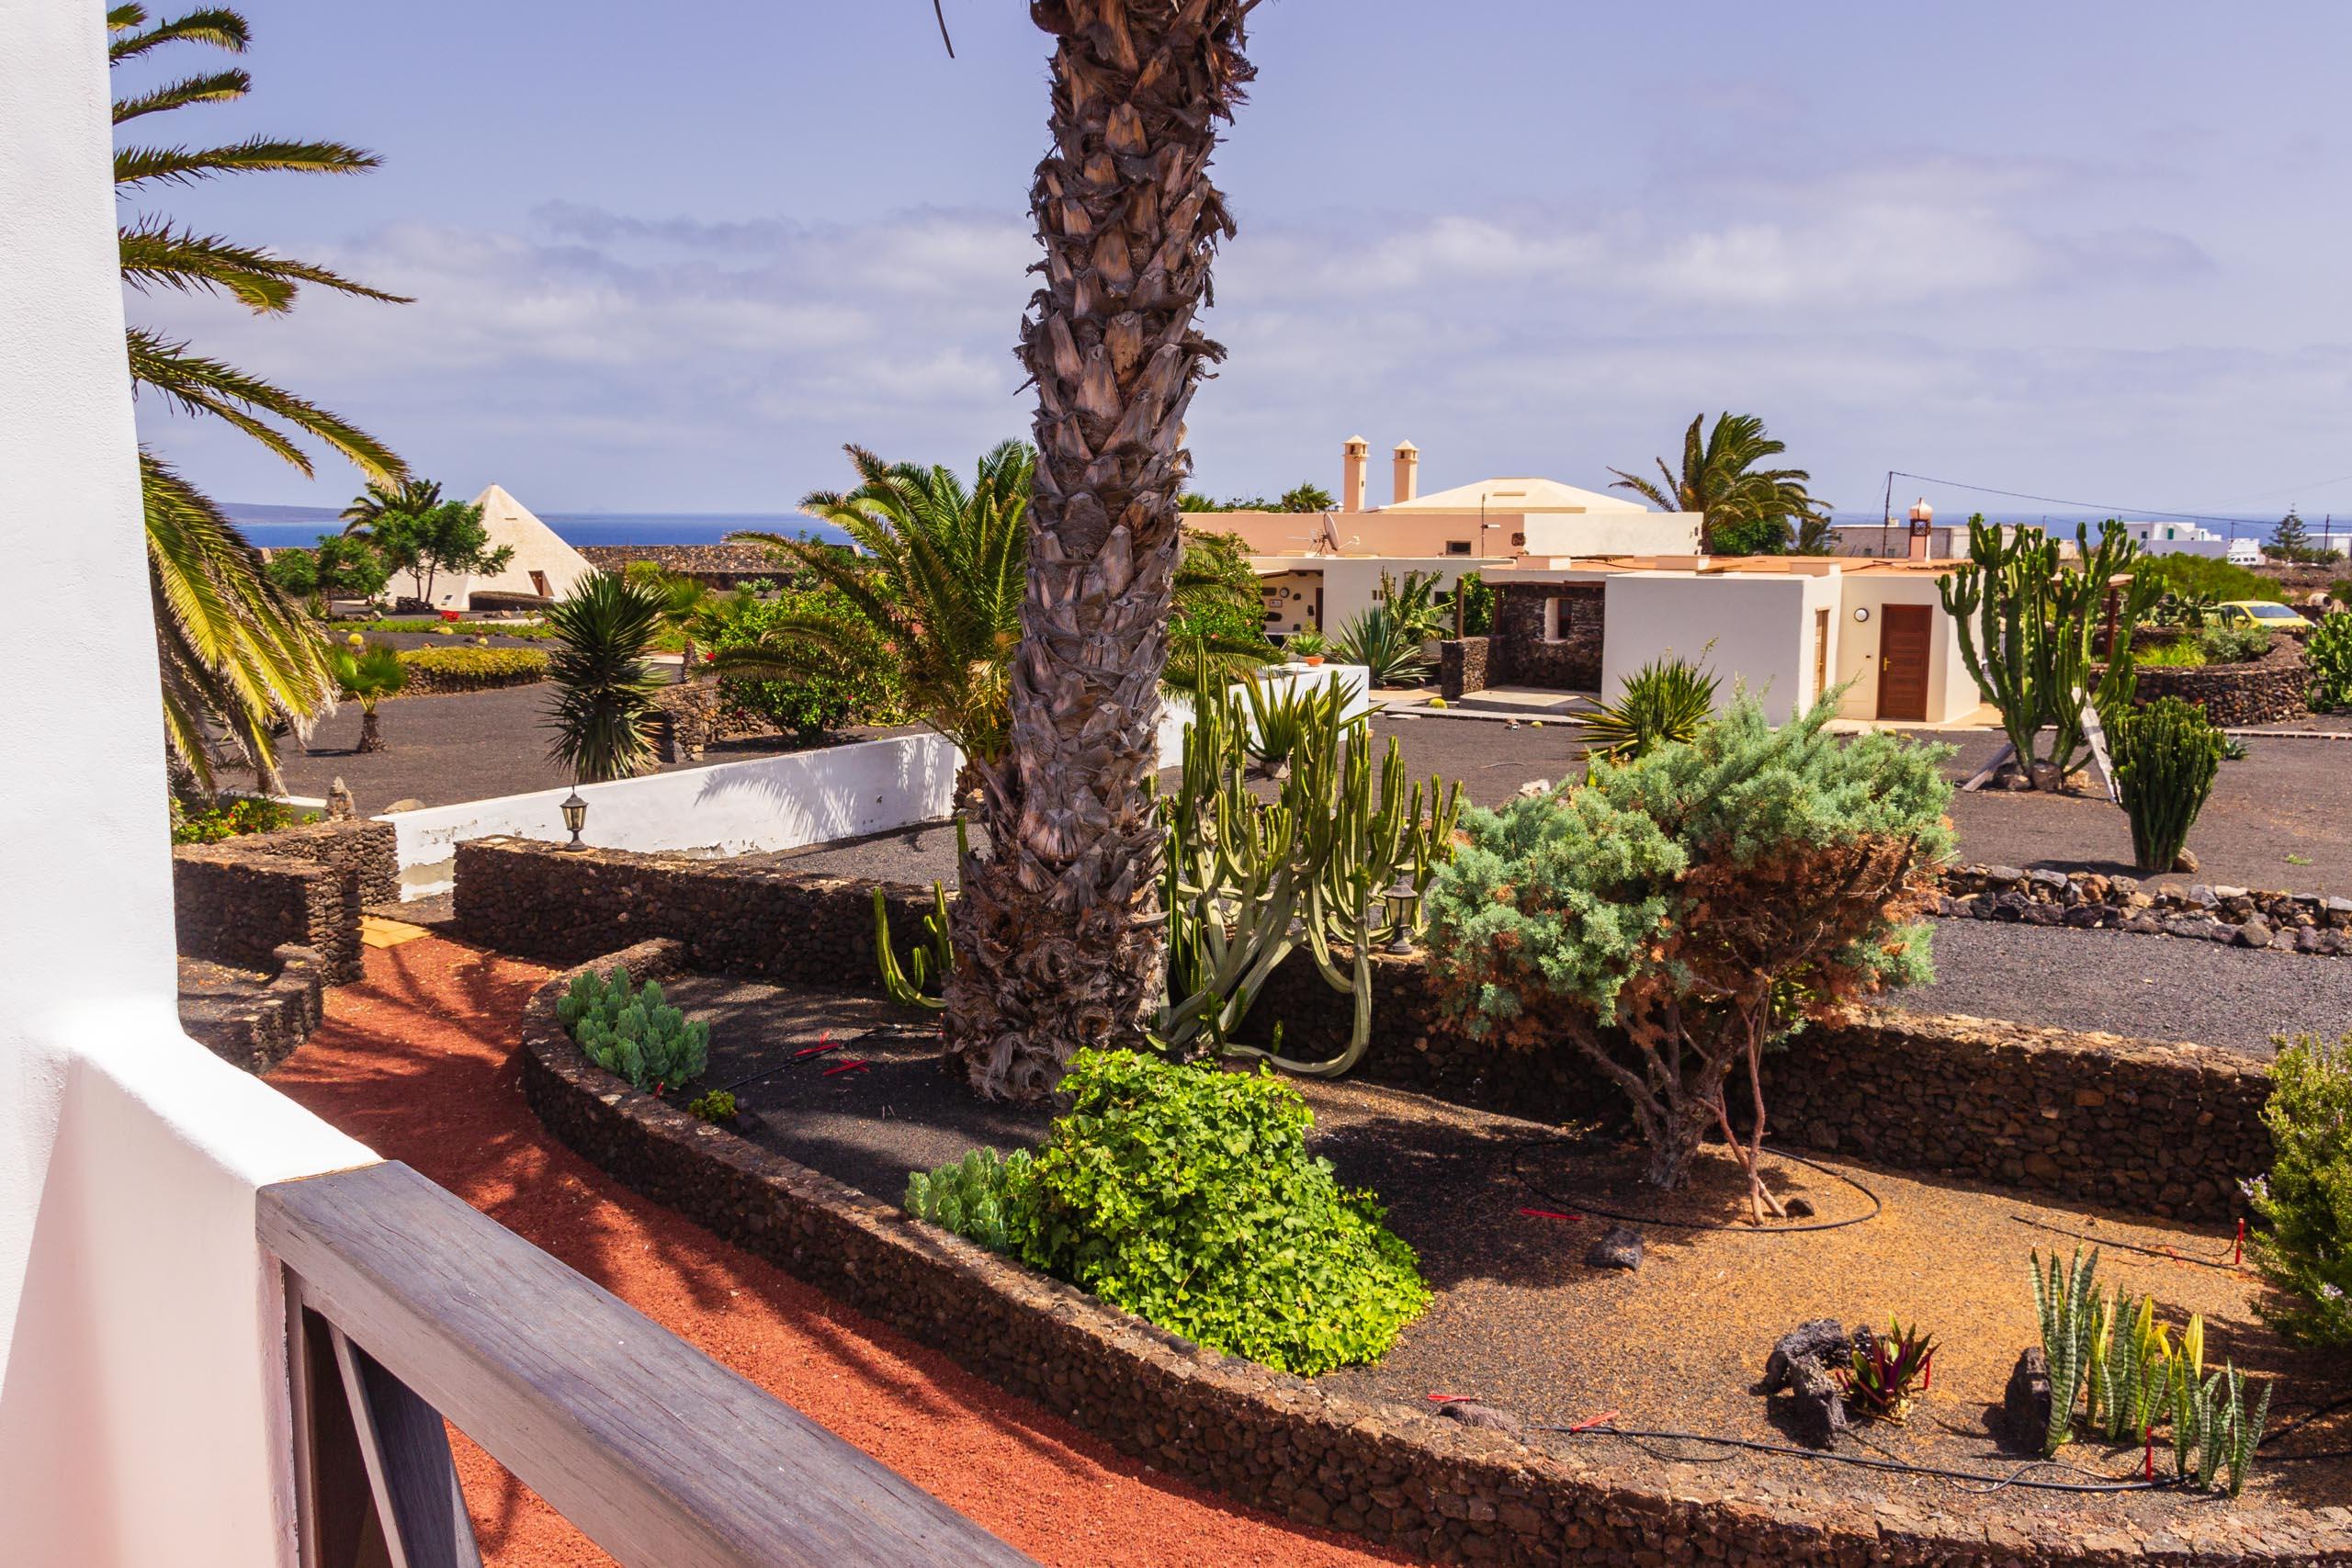 2016 09 Lanzarote GardenNeighbourhood 1 001